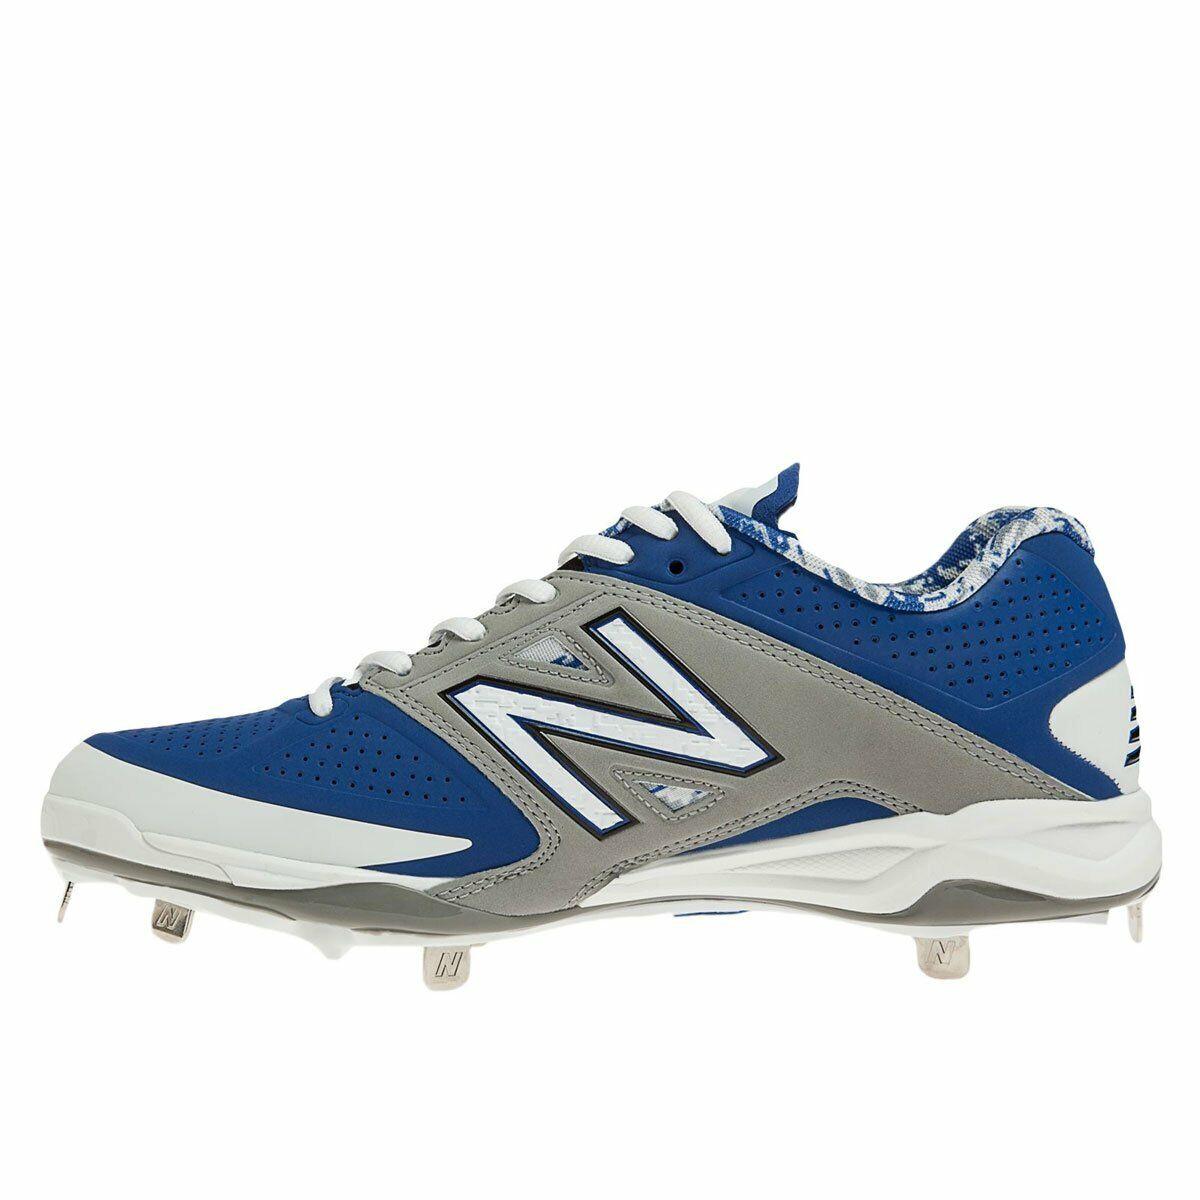 31b01491066 New Balance Mens L4040v2 Low Cleats bluee Grey D 7 Metal Baseball ...